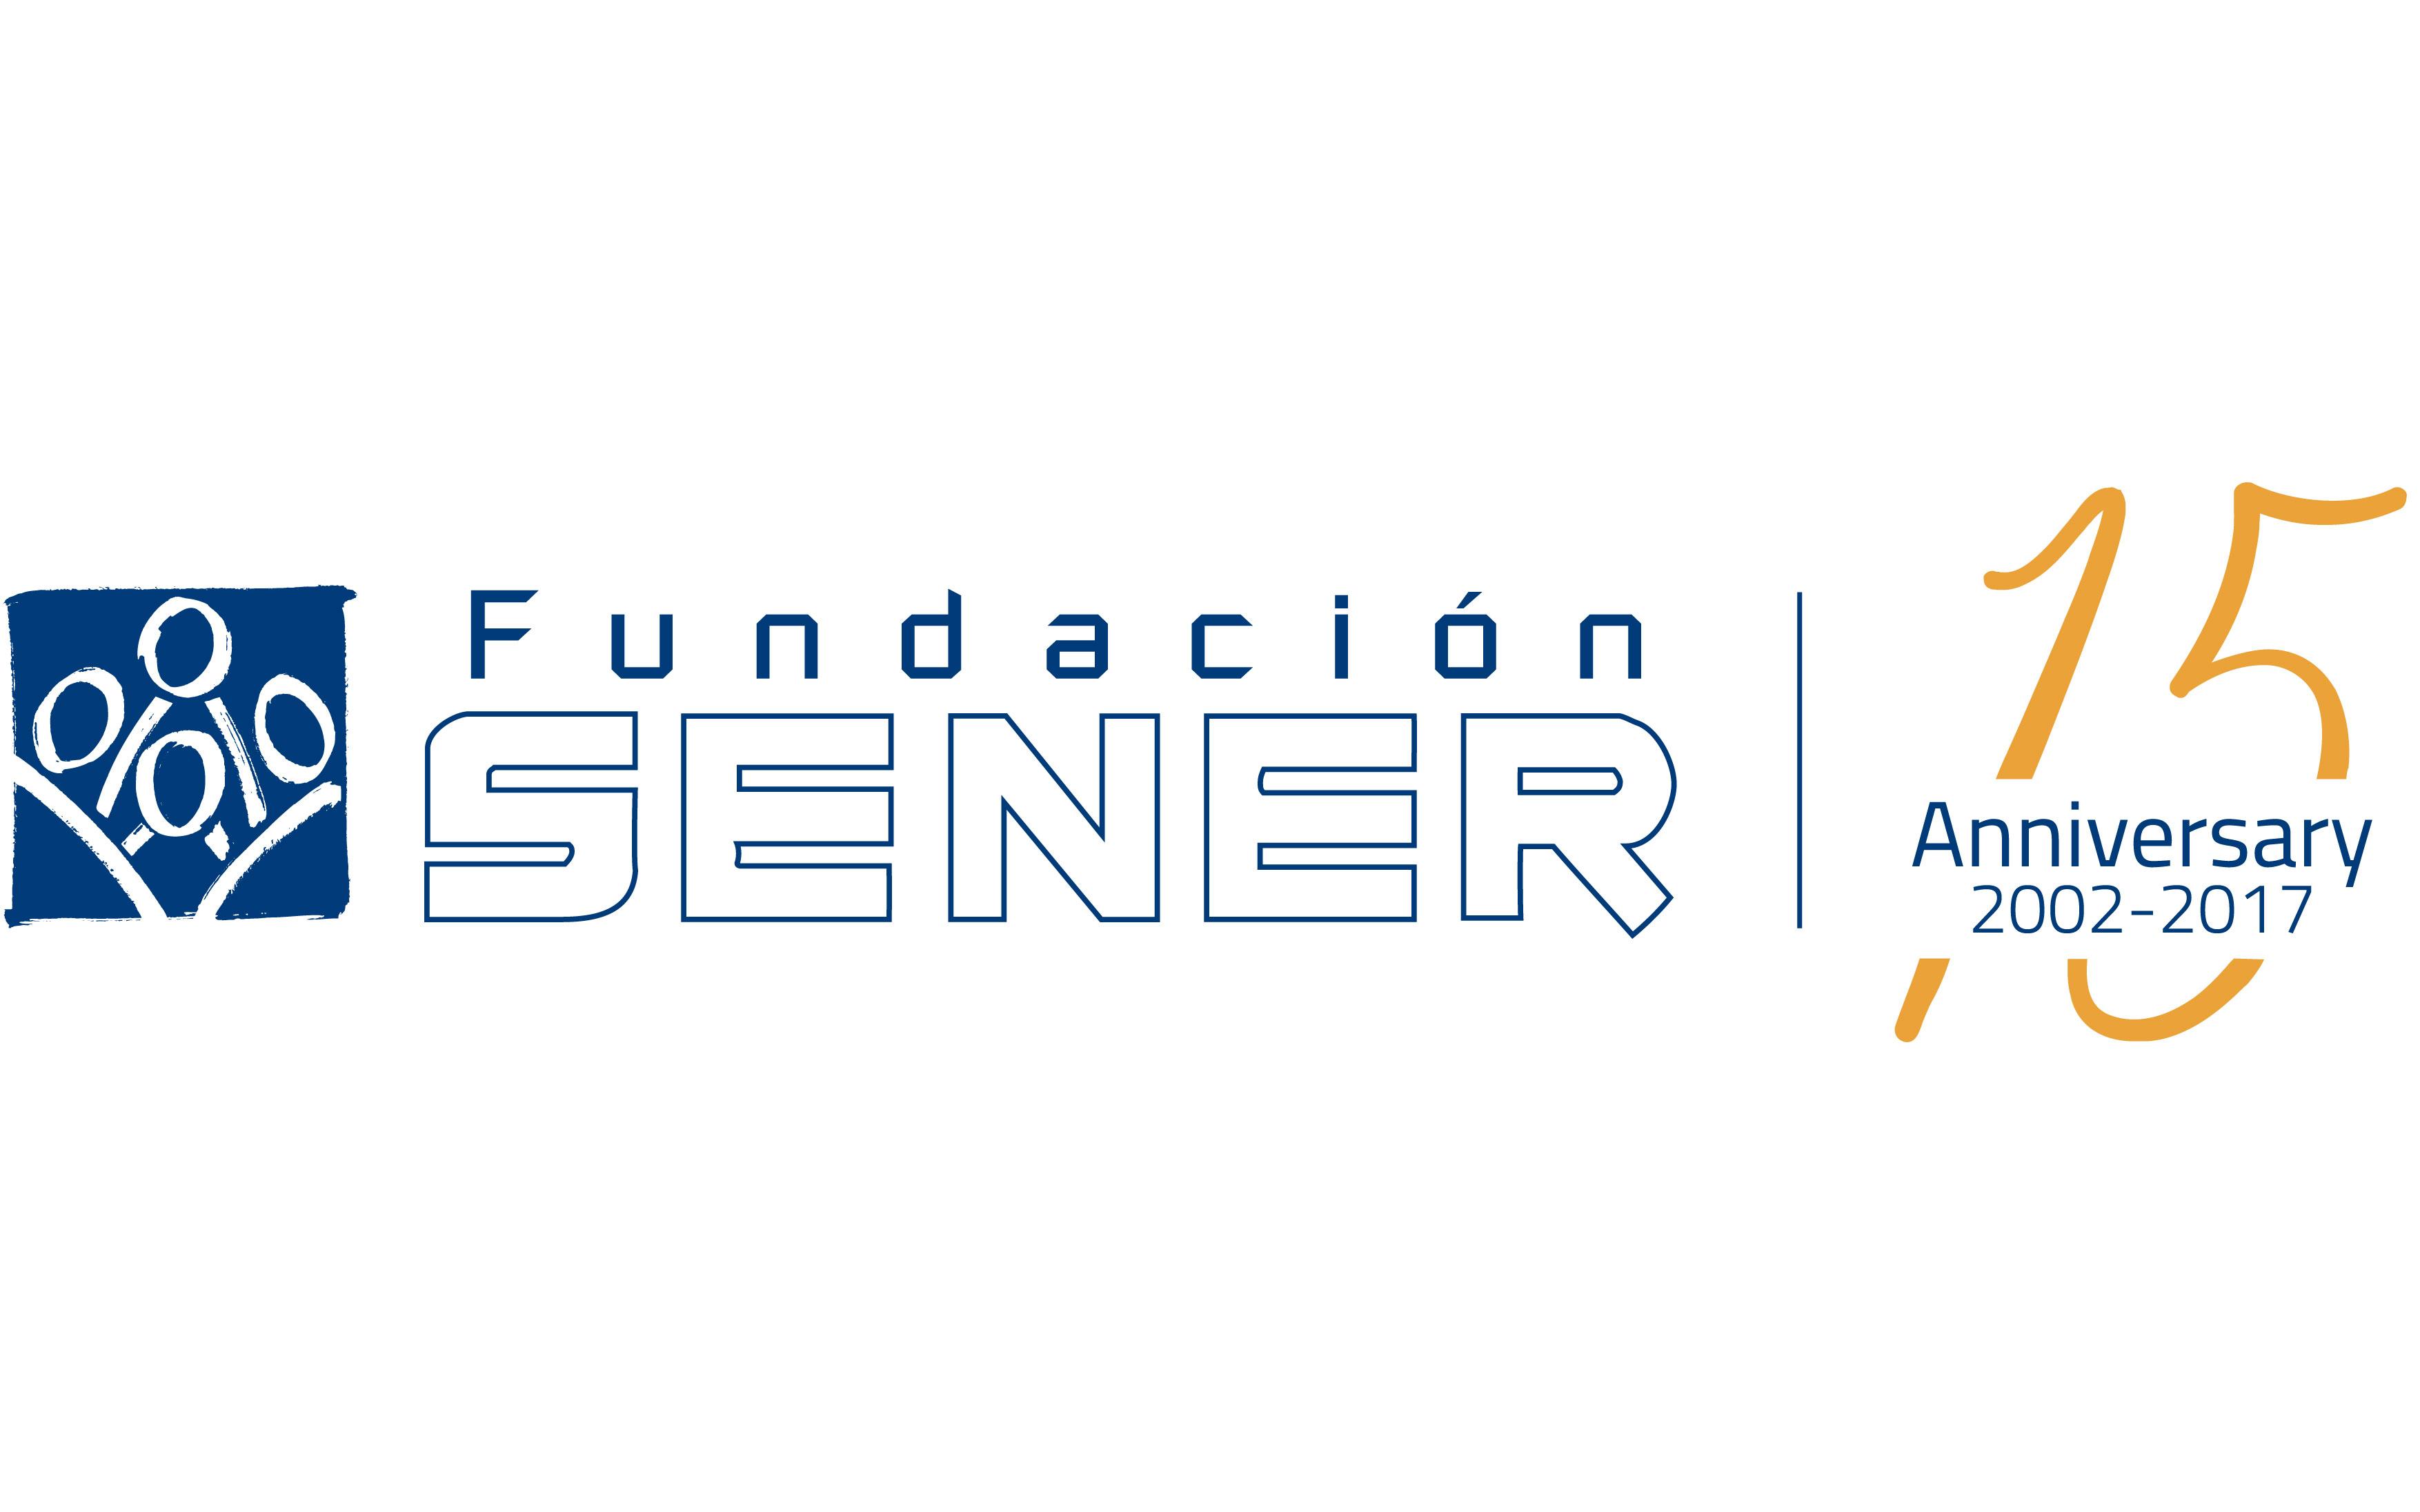 http://www.infrastructuresandtransport.sener/ecm-images/fundacion-sener-15-aniversario-1_replica_replica